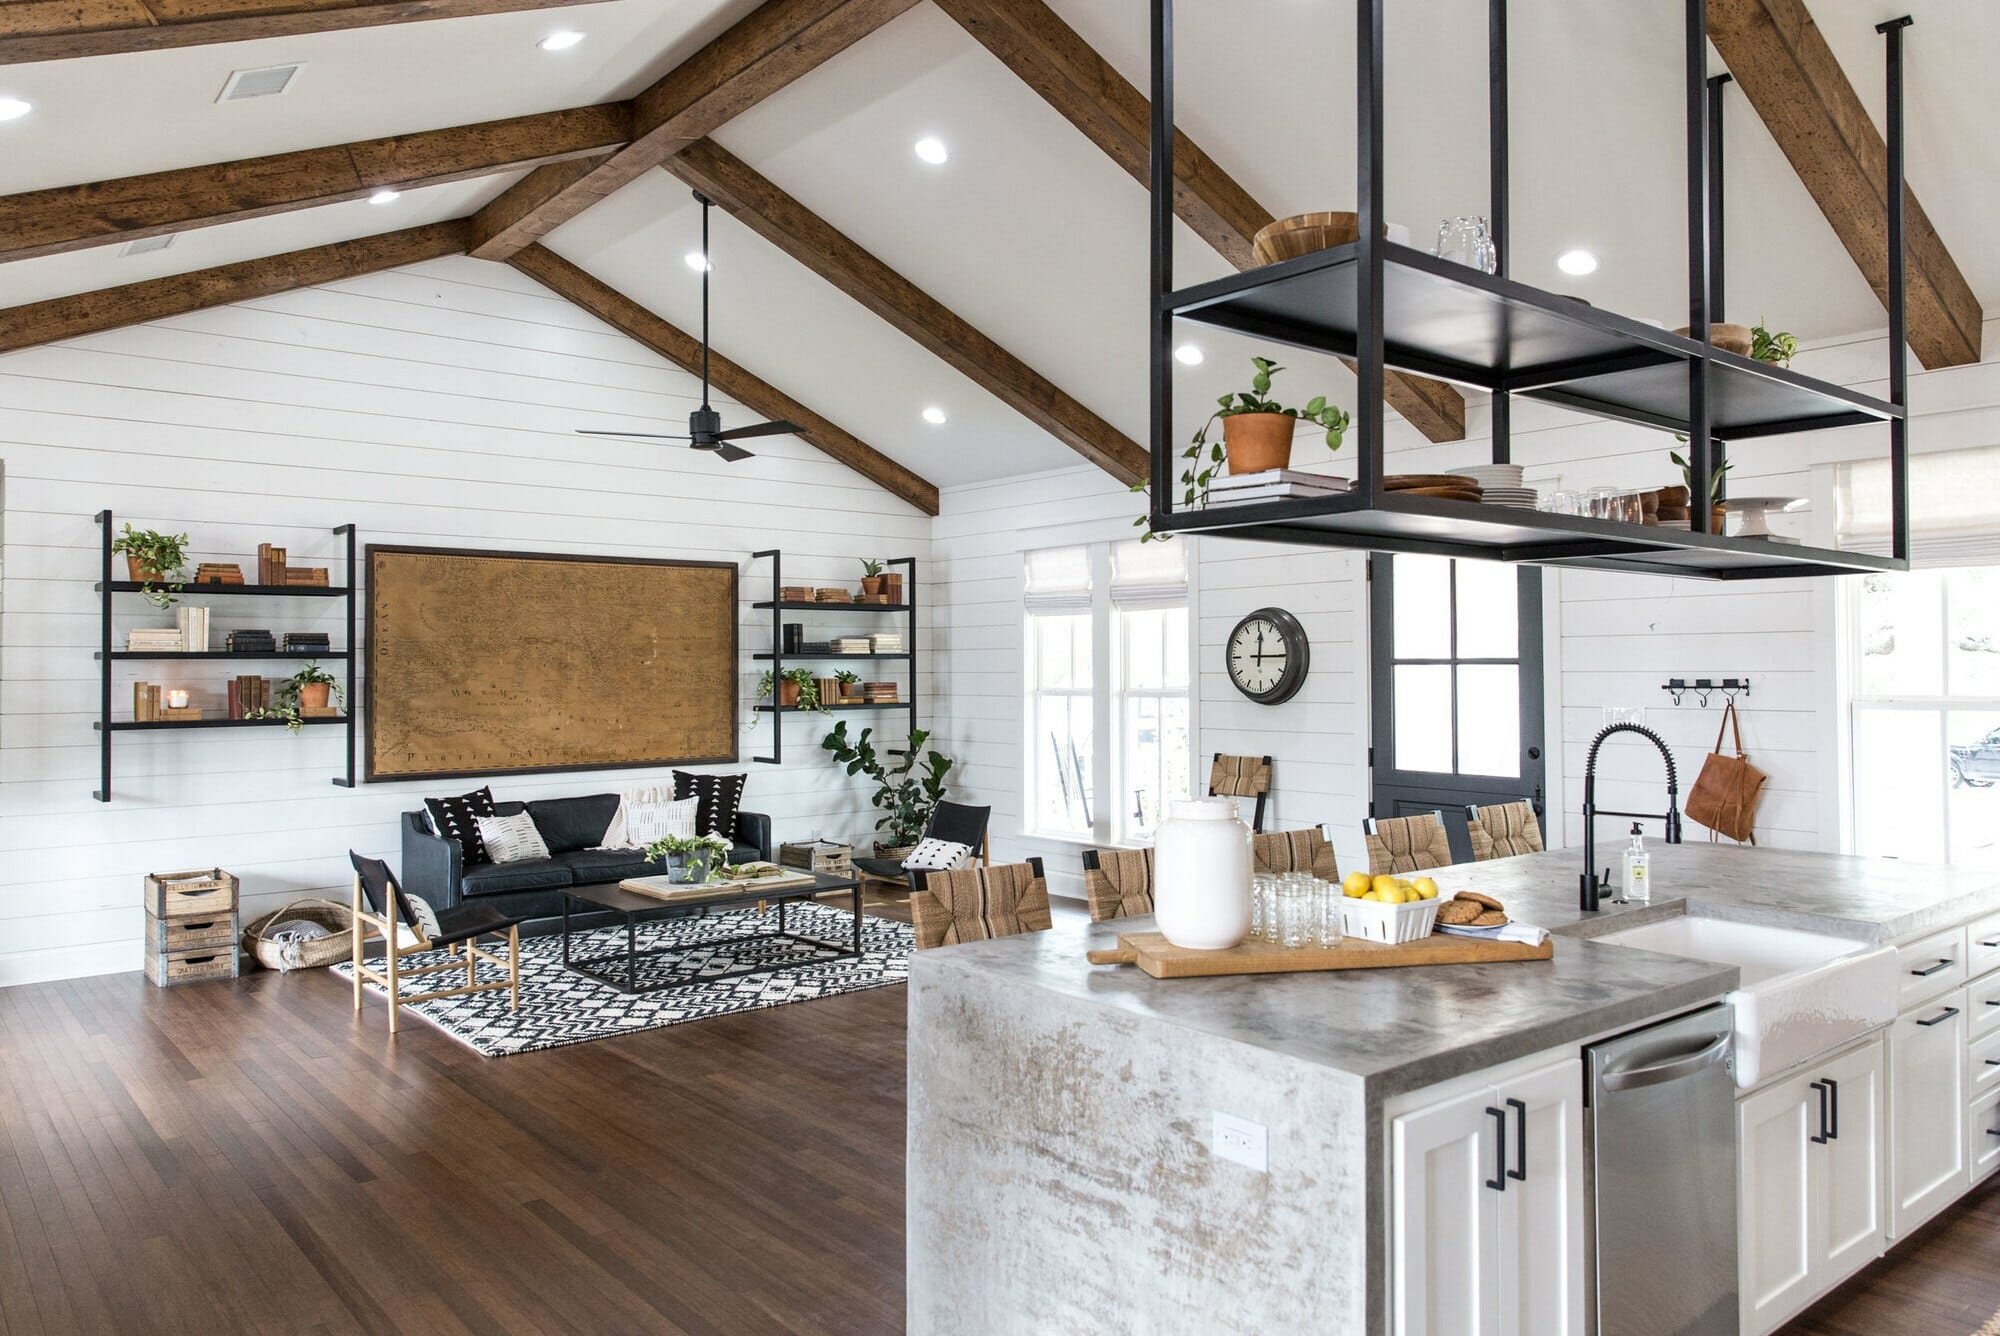 2019 home decor trends ceiling